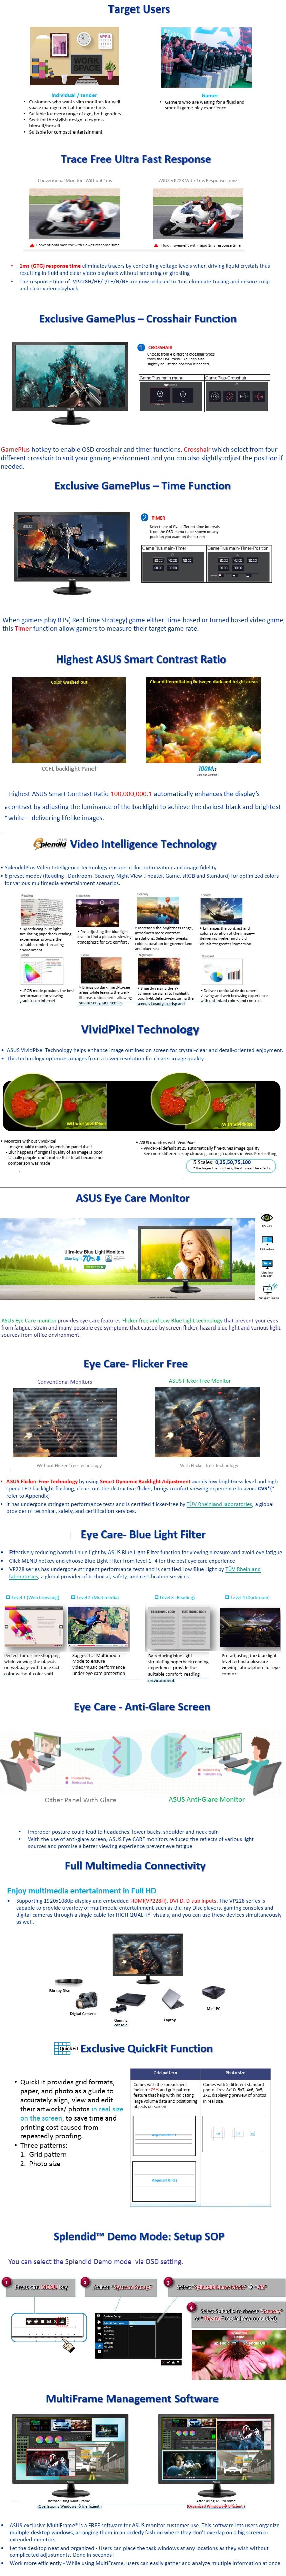 https://assetscdn1.paytm.com/images/catalog/product/C/CO/COMSAASAXDC-ADFMERC572065B55E259/634.png